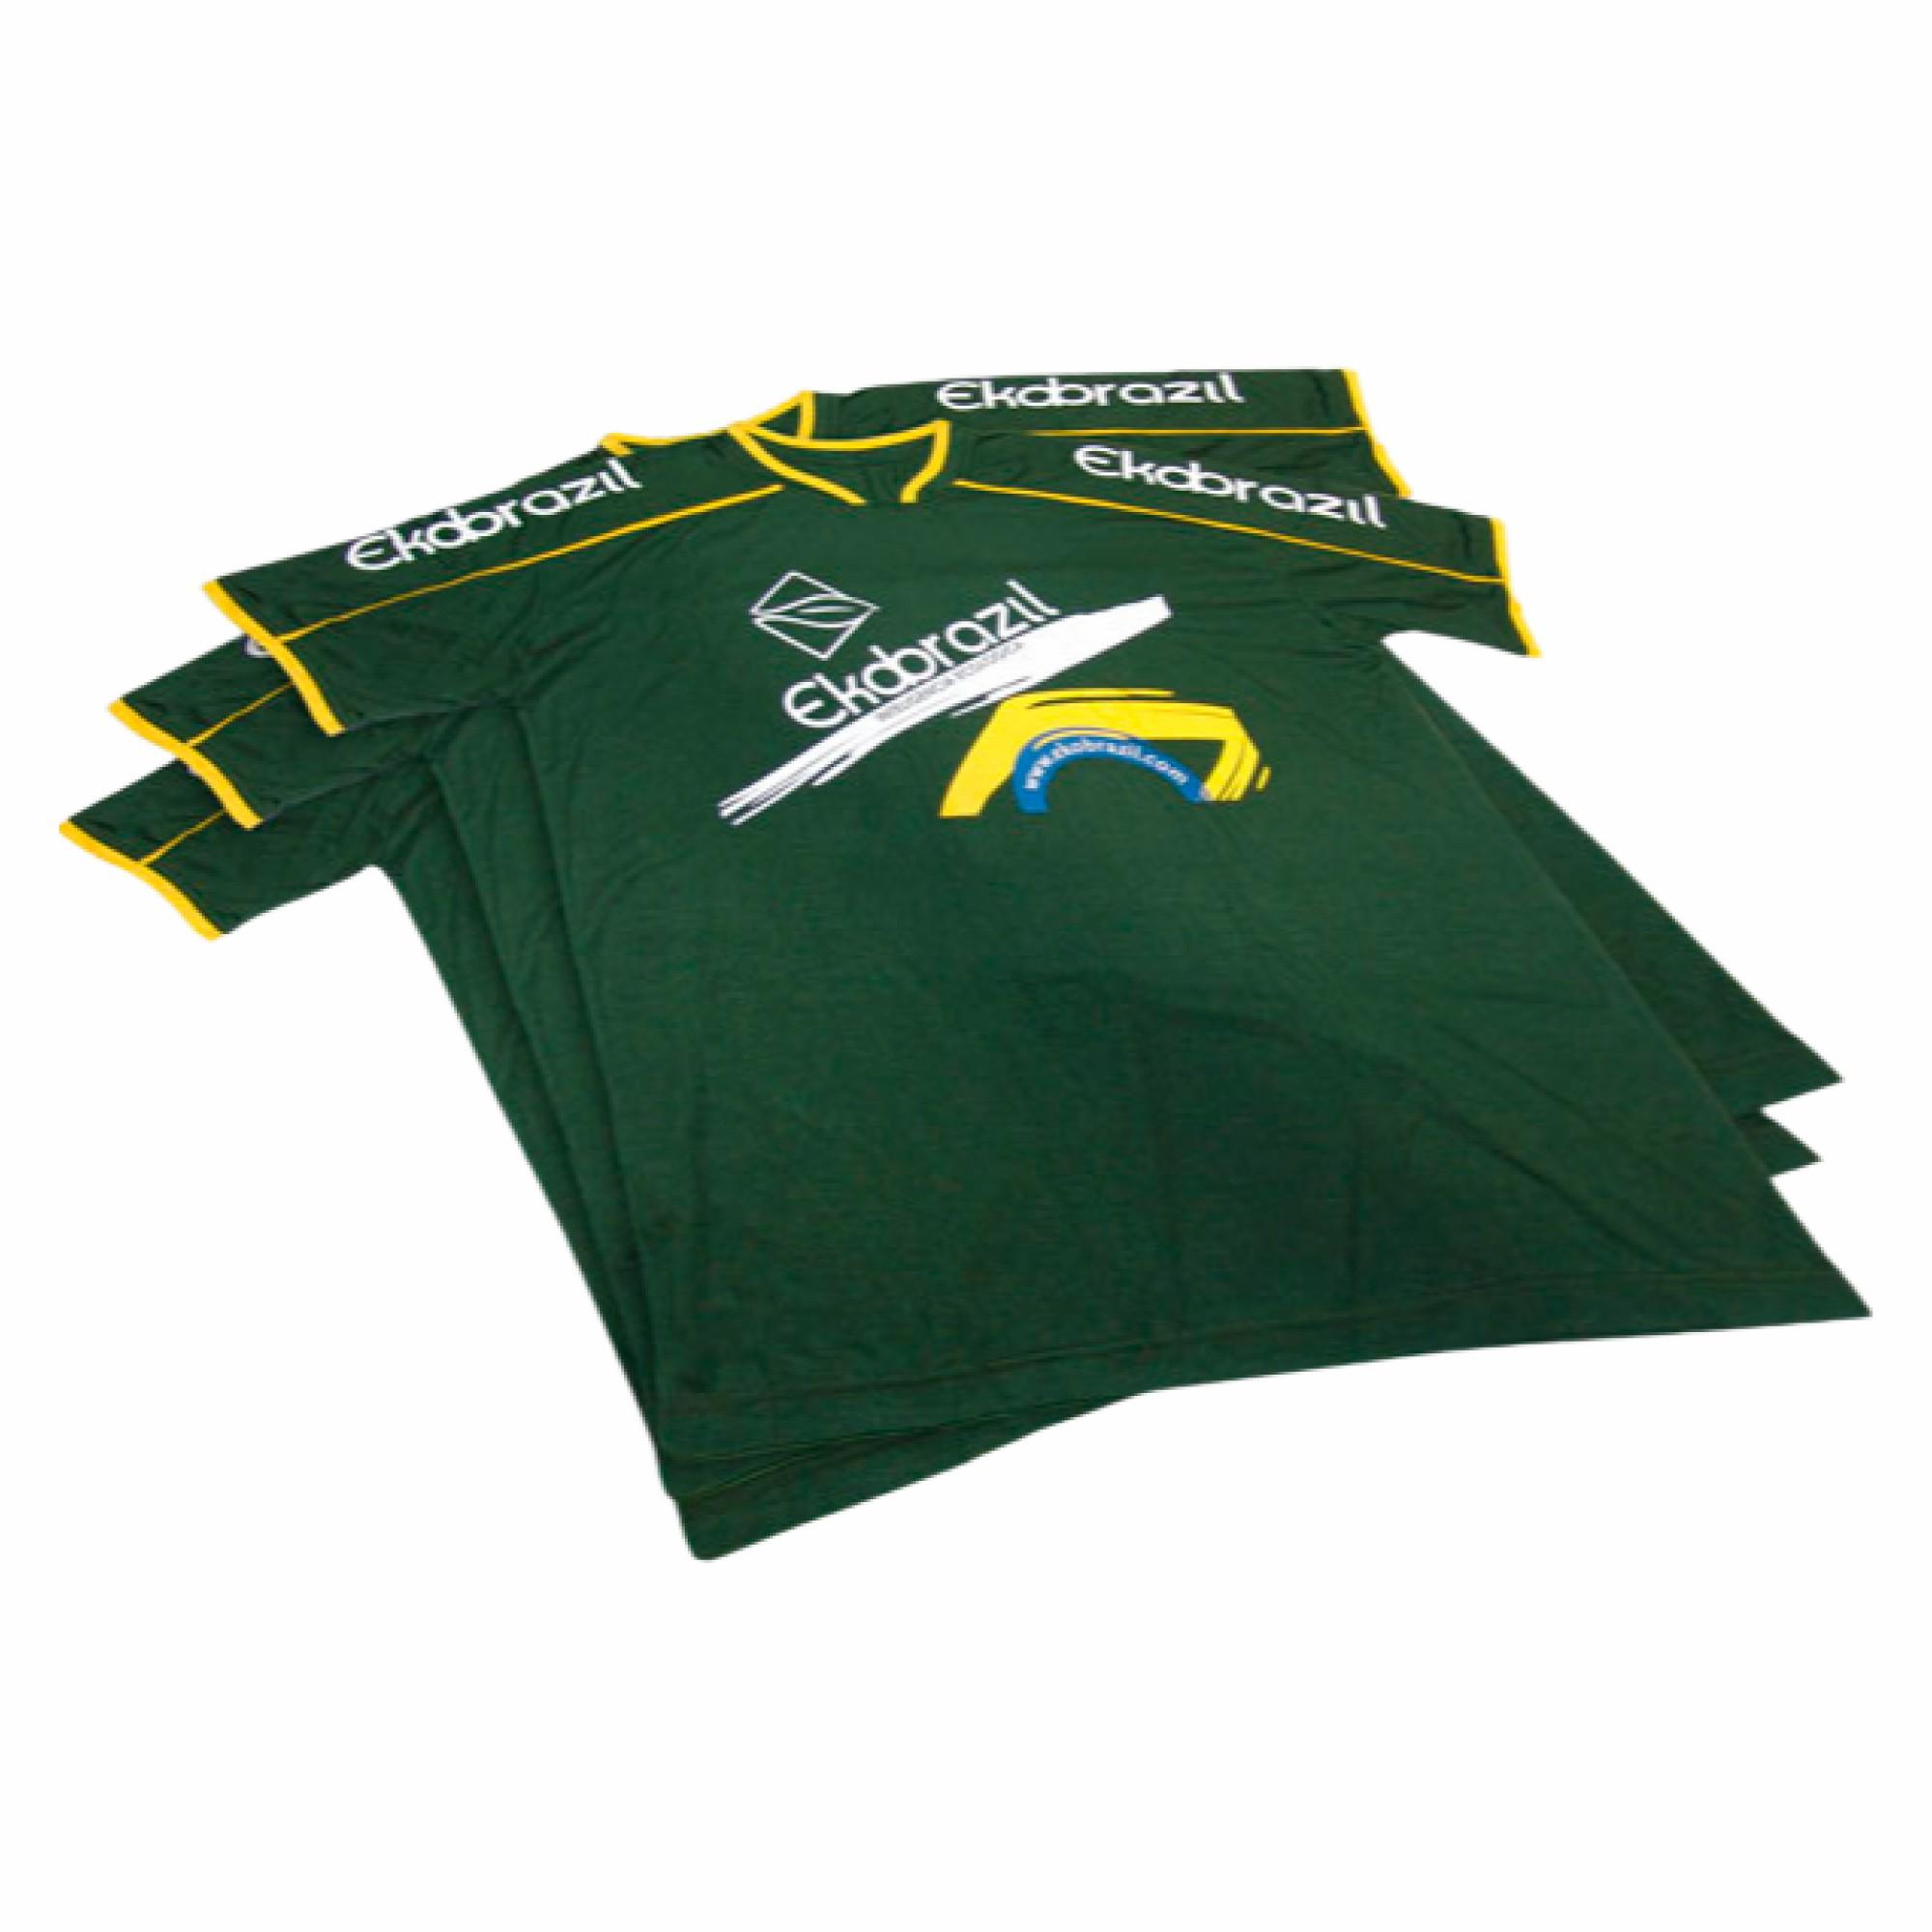 Preço Camiseta Ekobrazil P